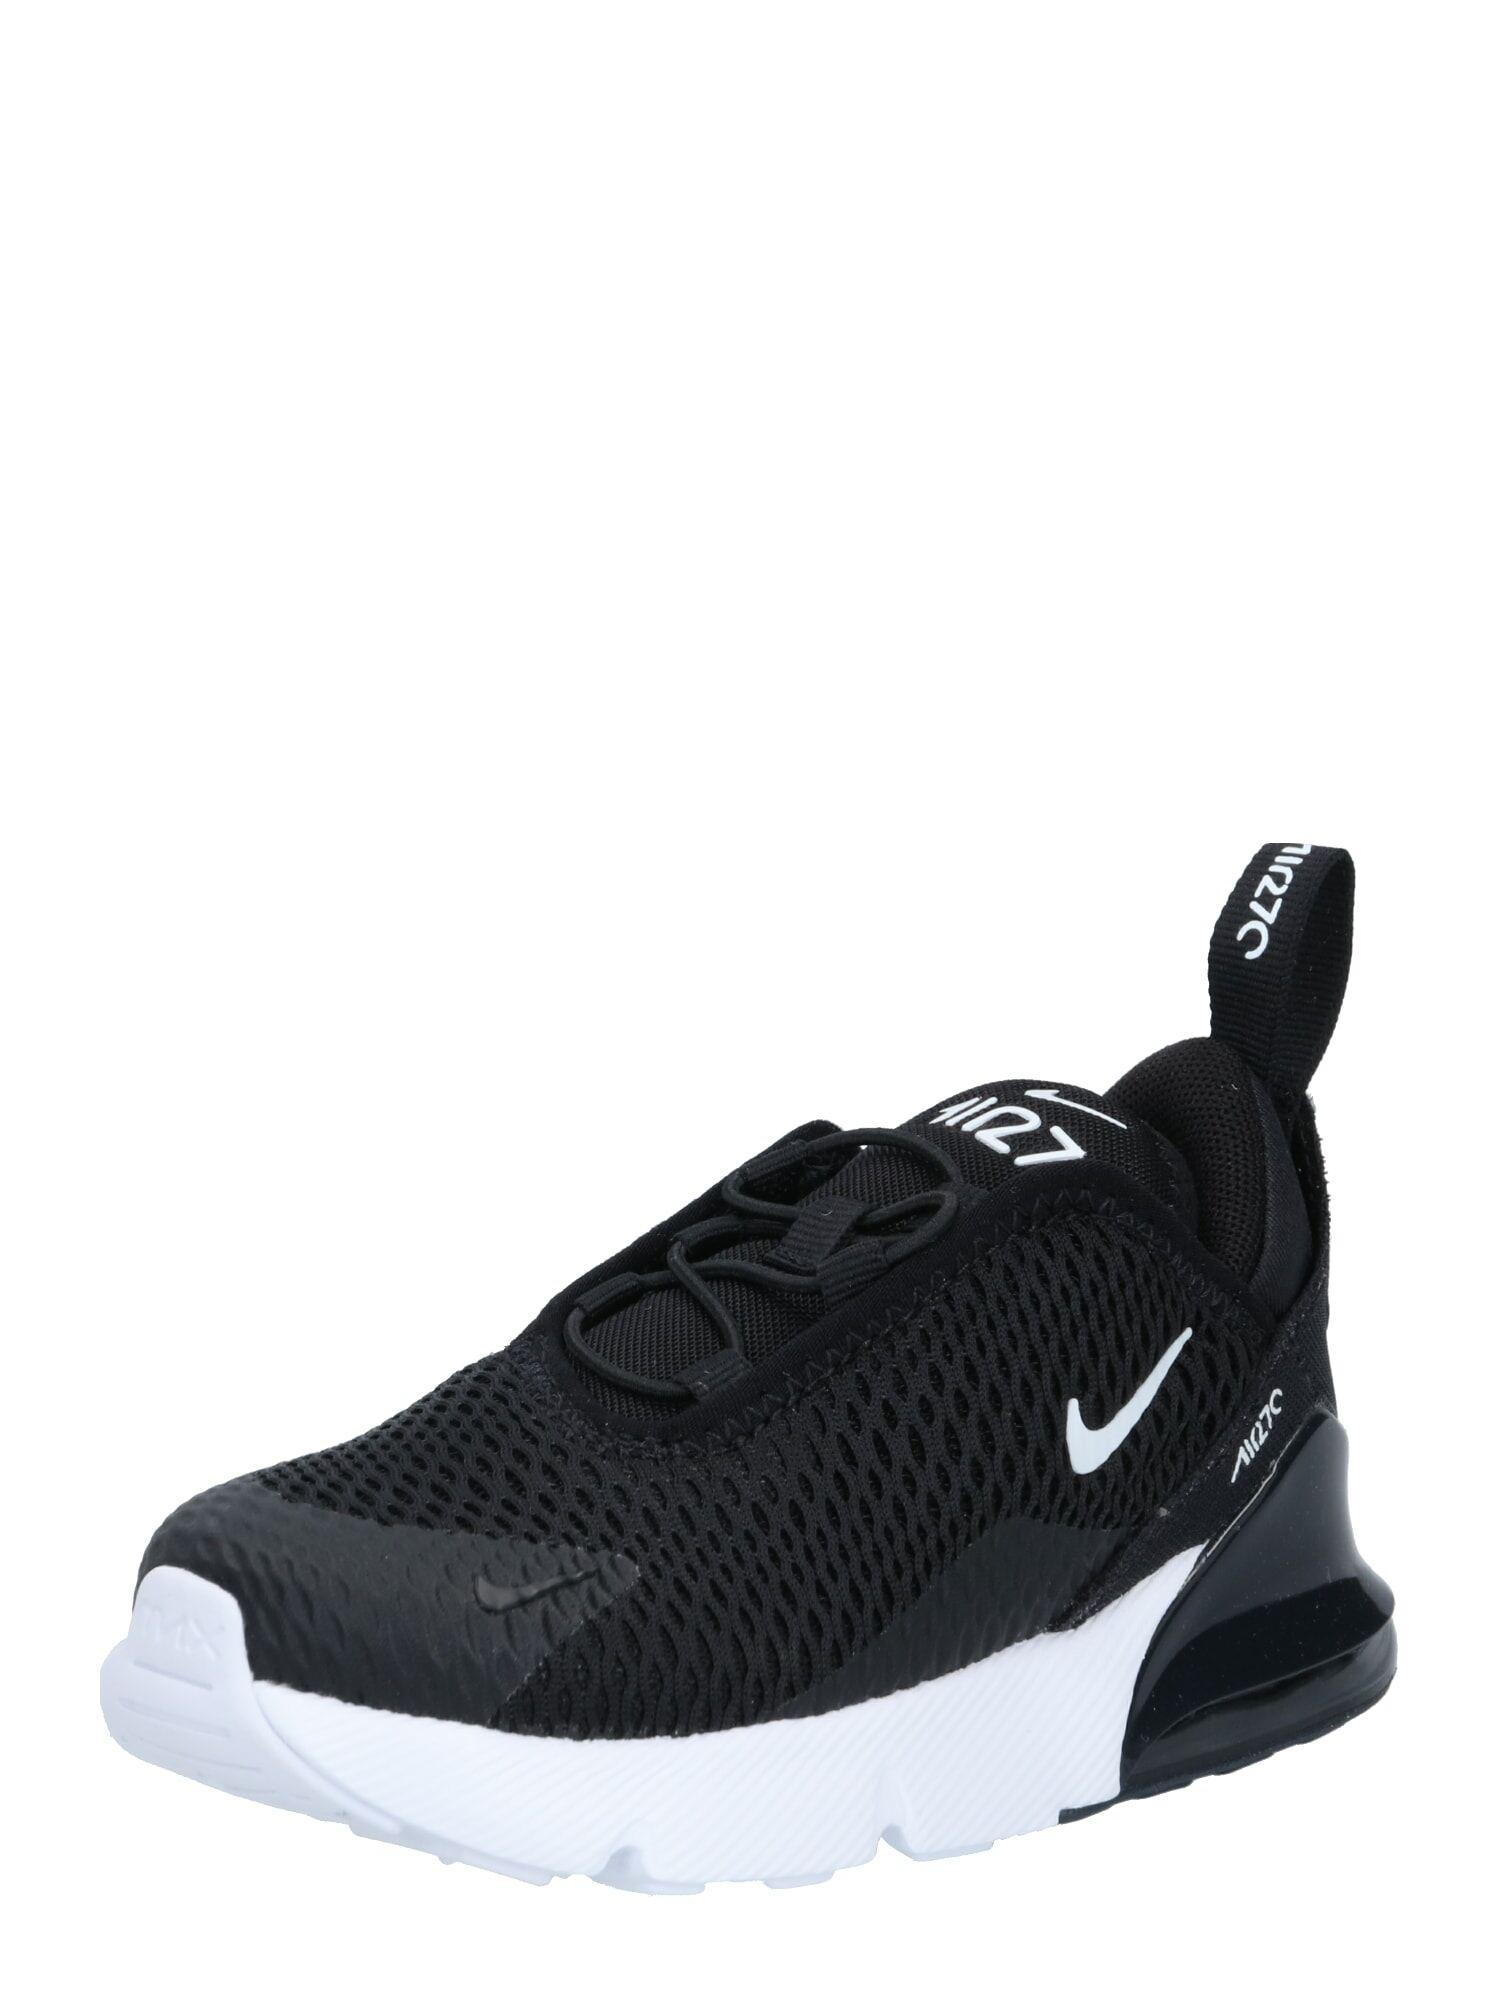 Nike Sportswear Baskets 'Air Max 270'  - Noir - Taille: 3C - boy